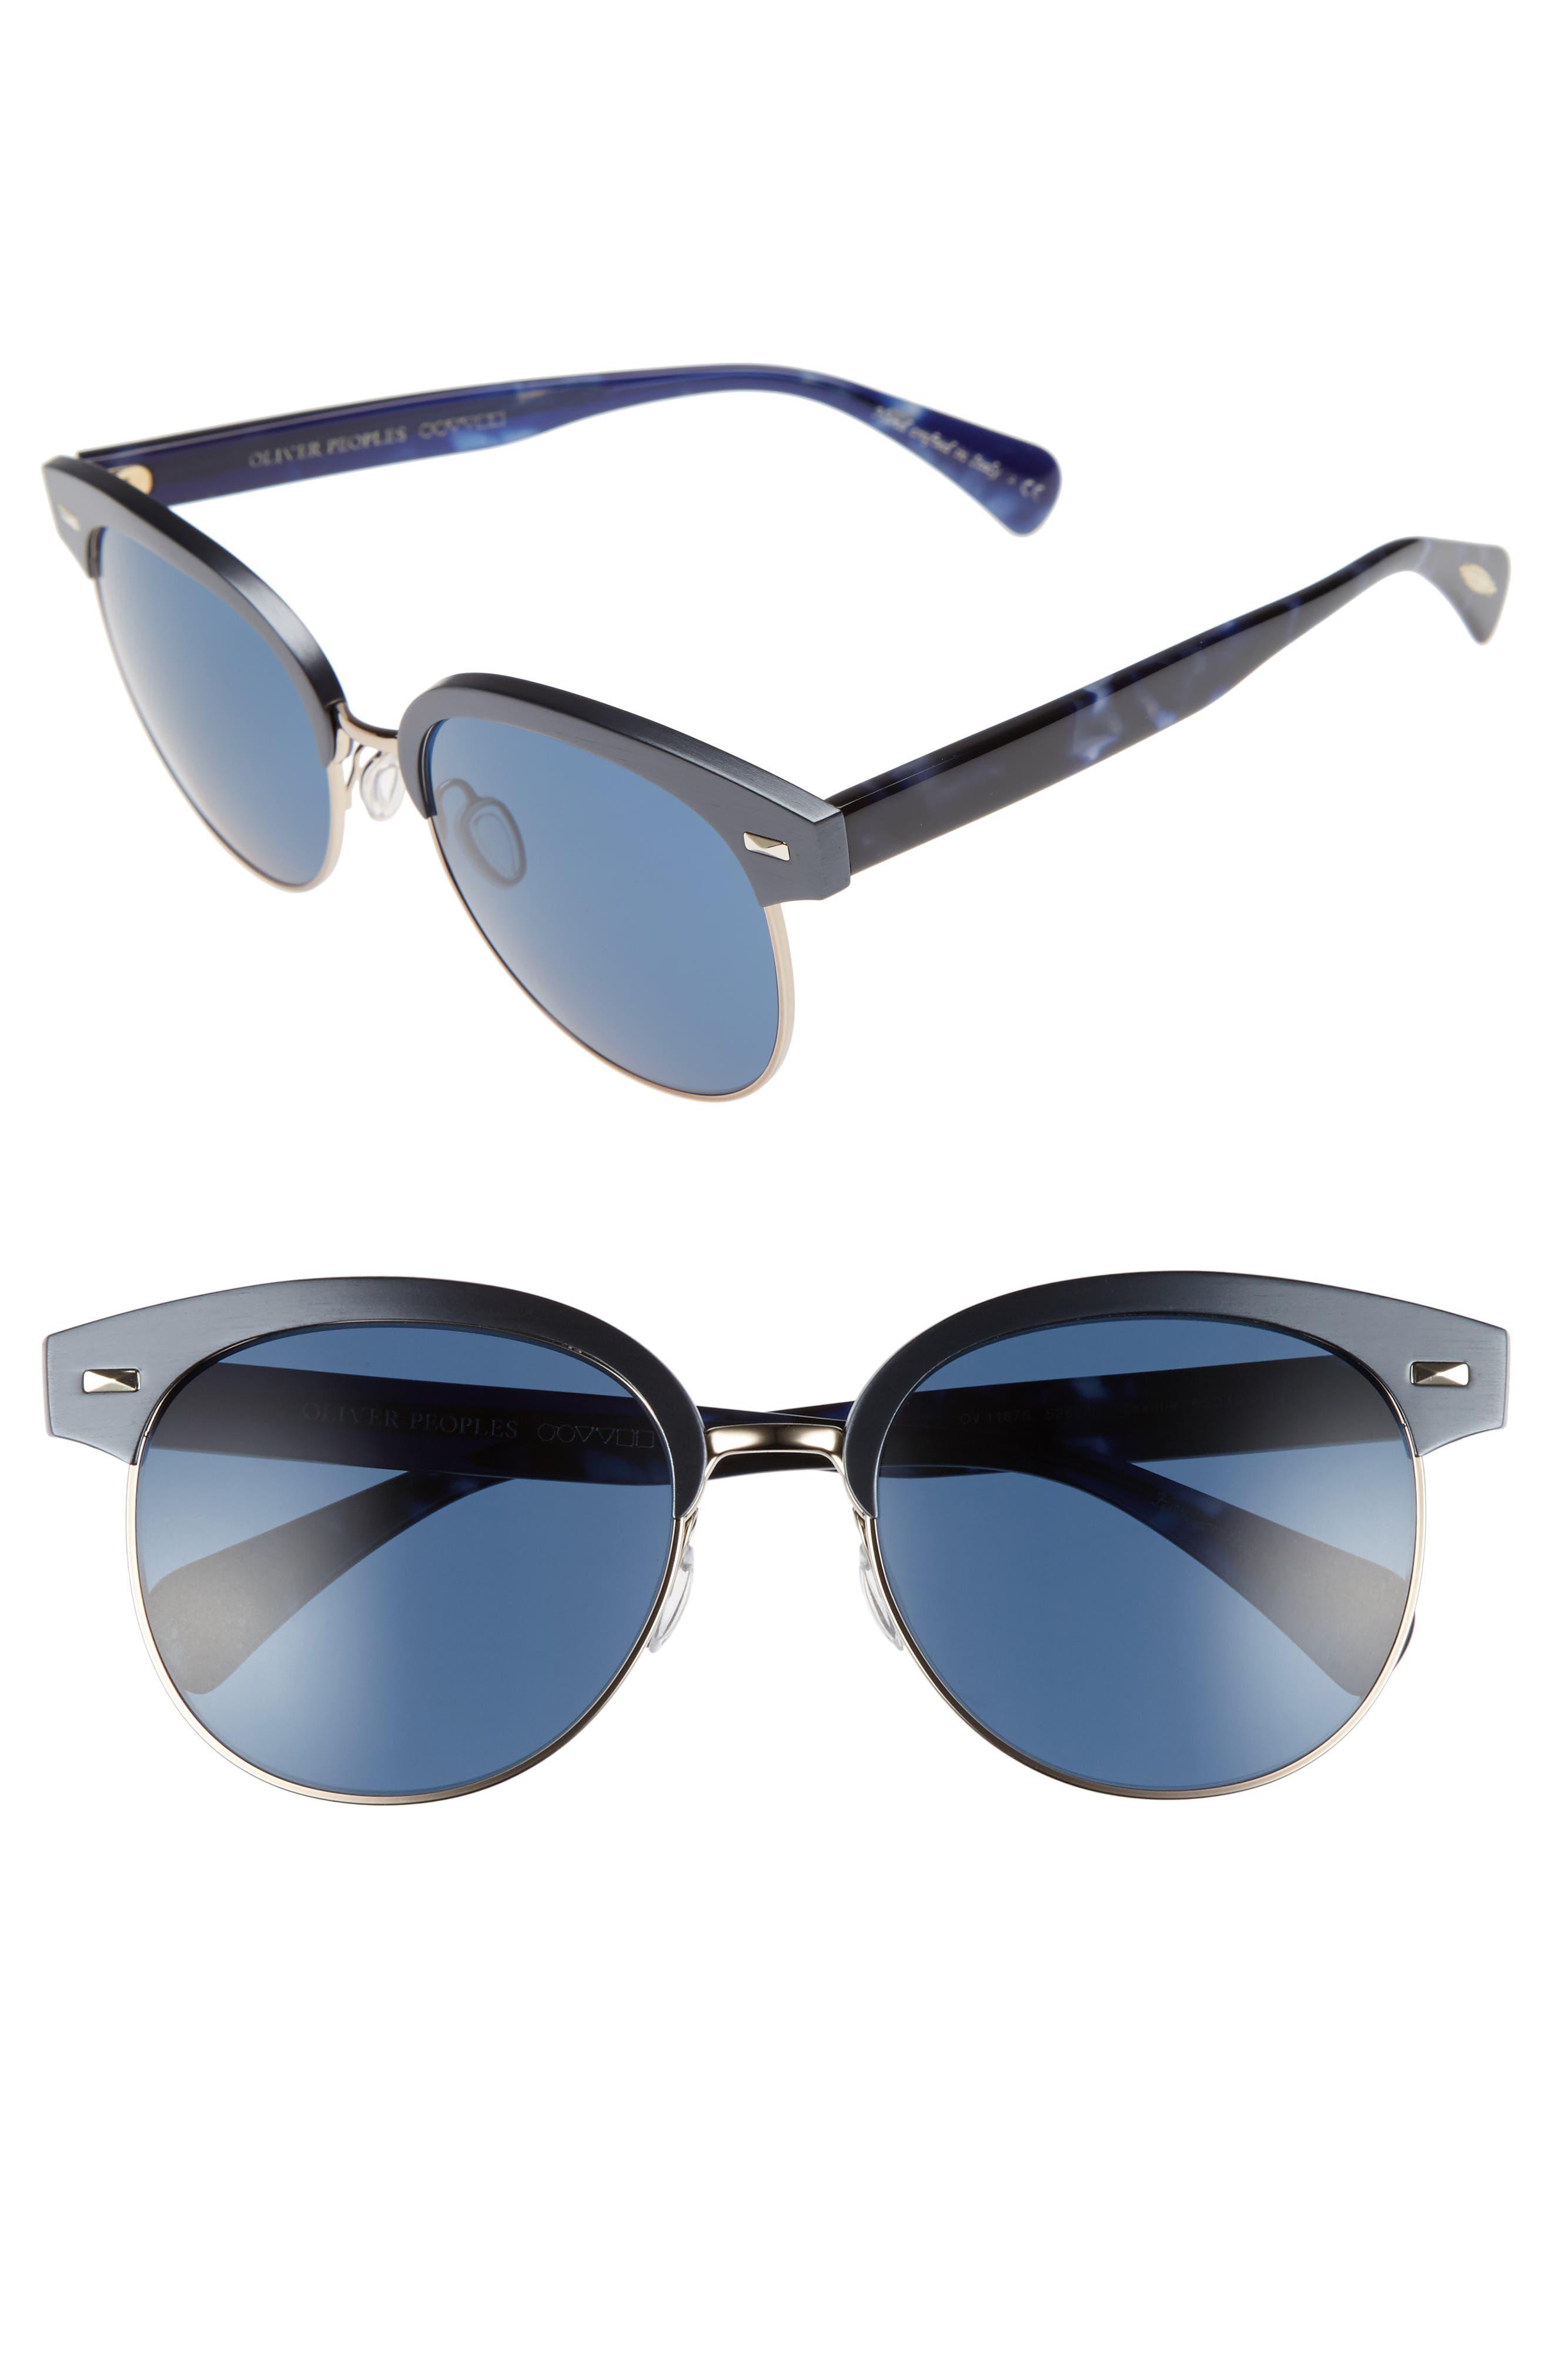 Alternate Image 1 Selected - Oliver Peoples Shaelie 55mm Mirrored Semi-Rim Sunglasses